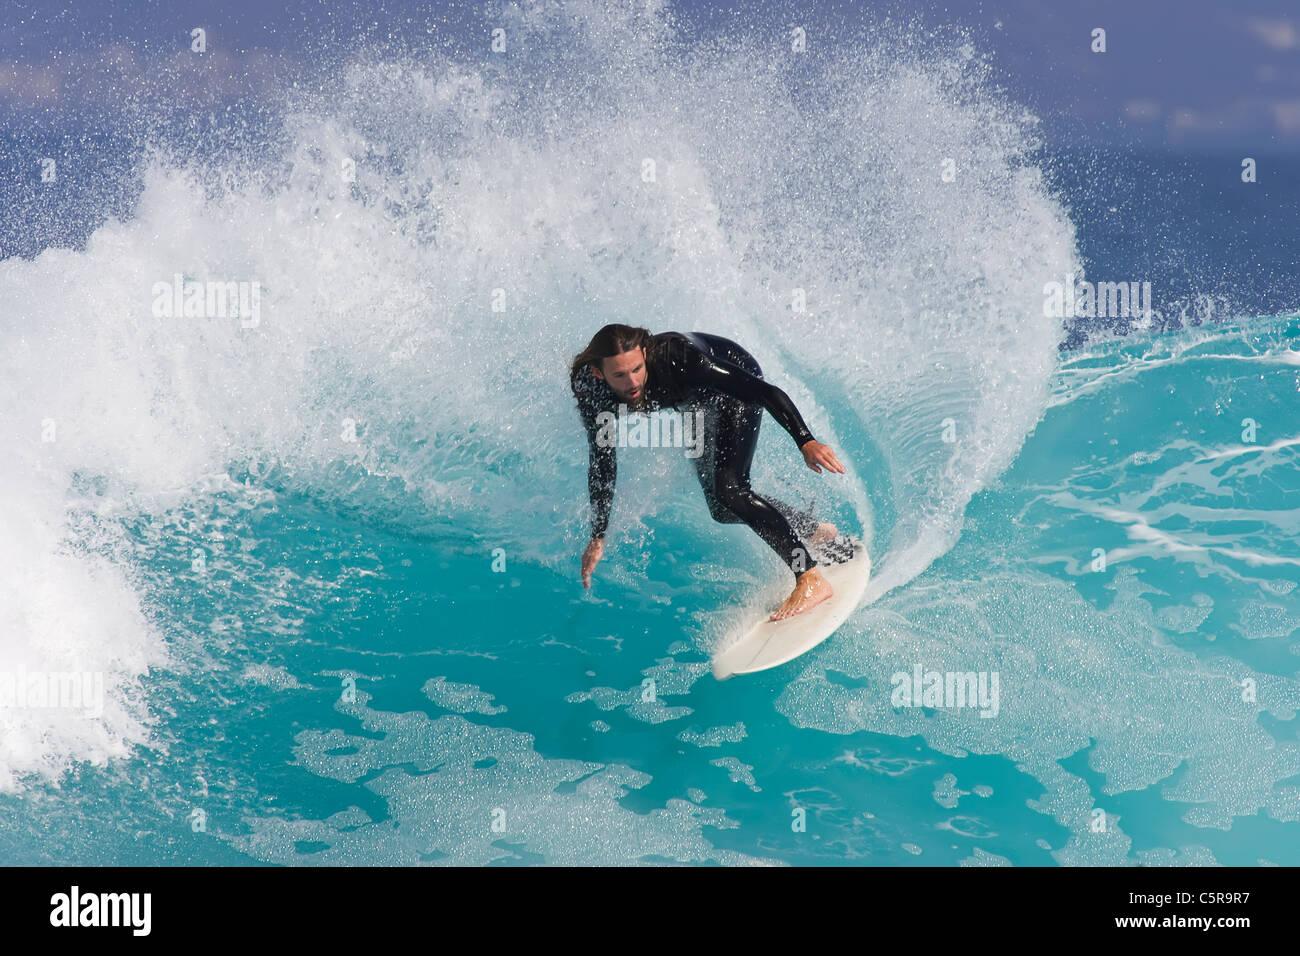 Surfer rides along azure blue wave. - Stock Image